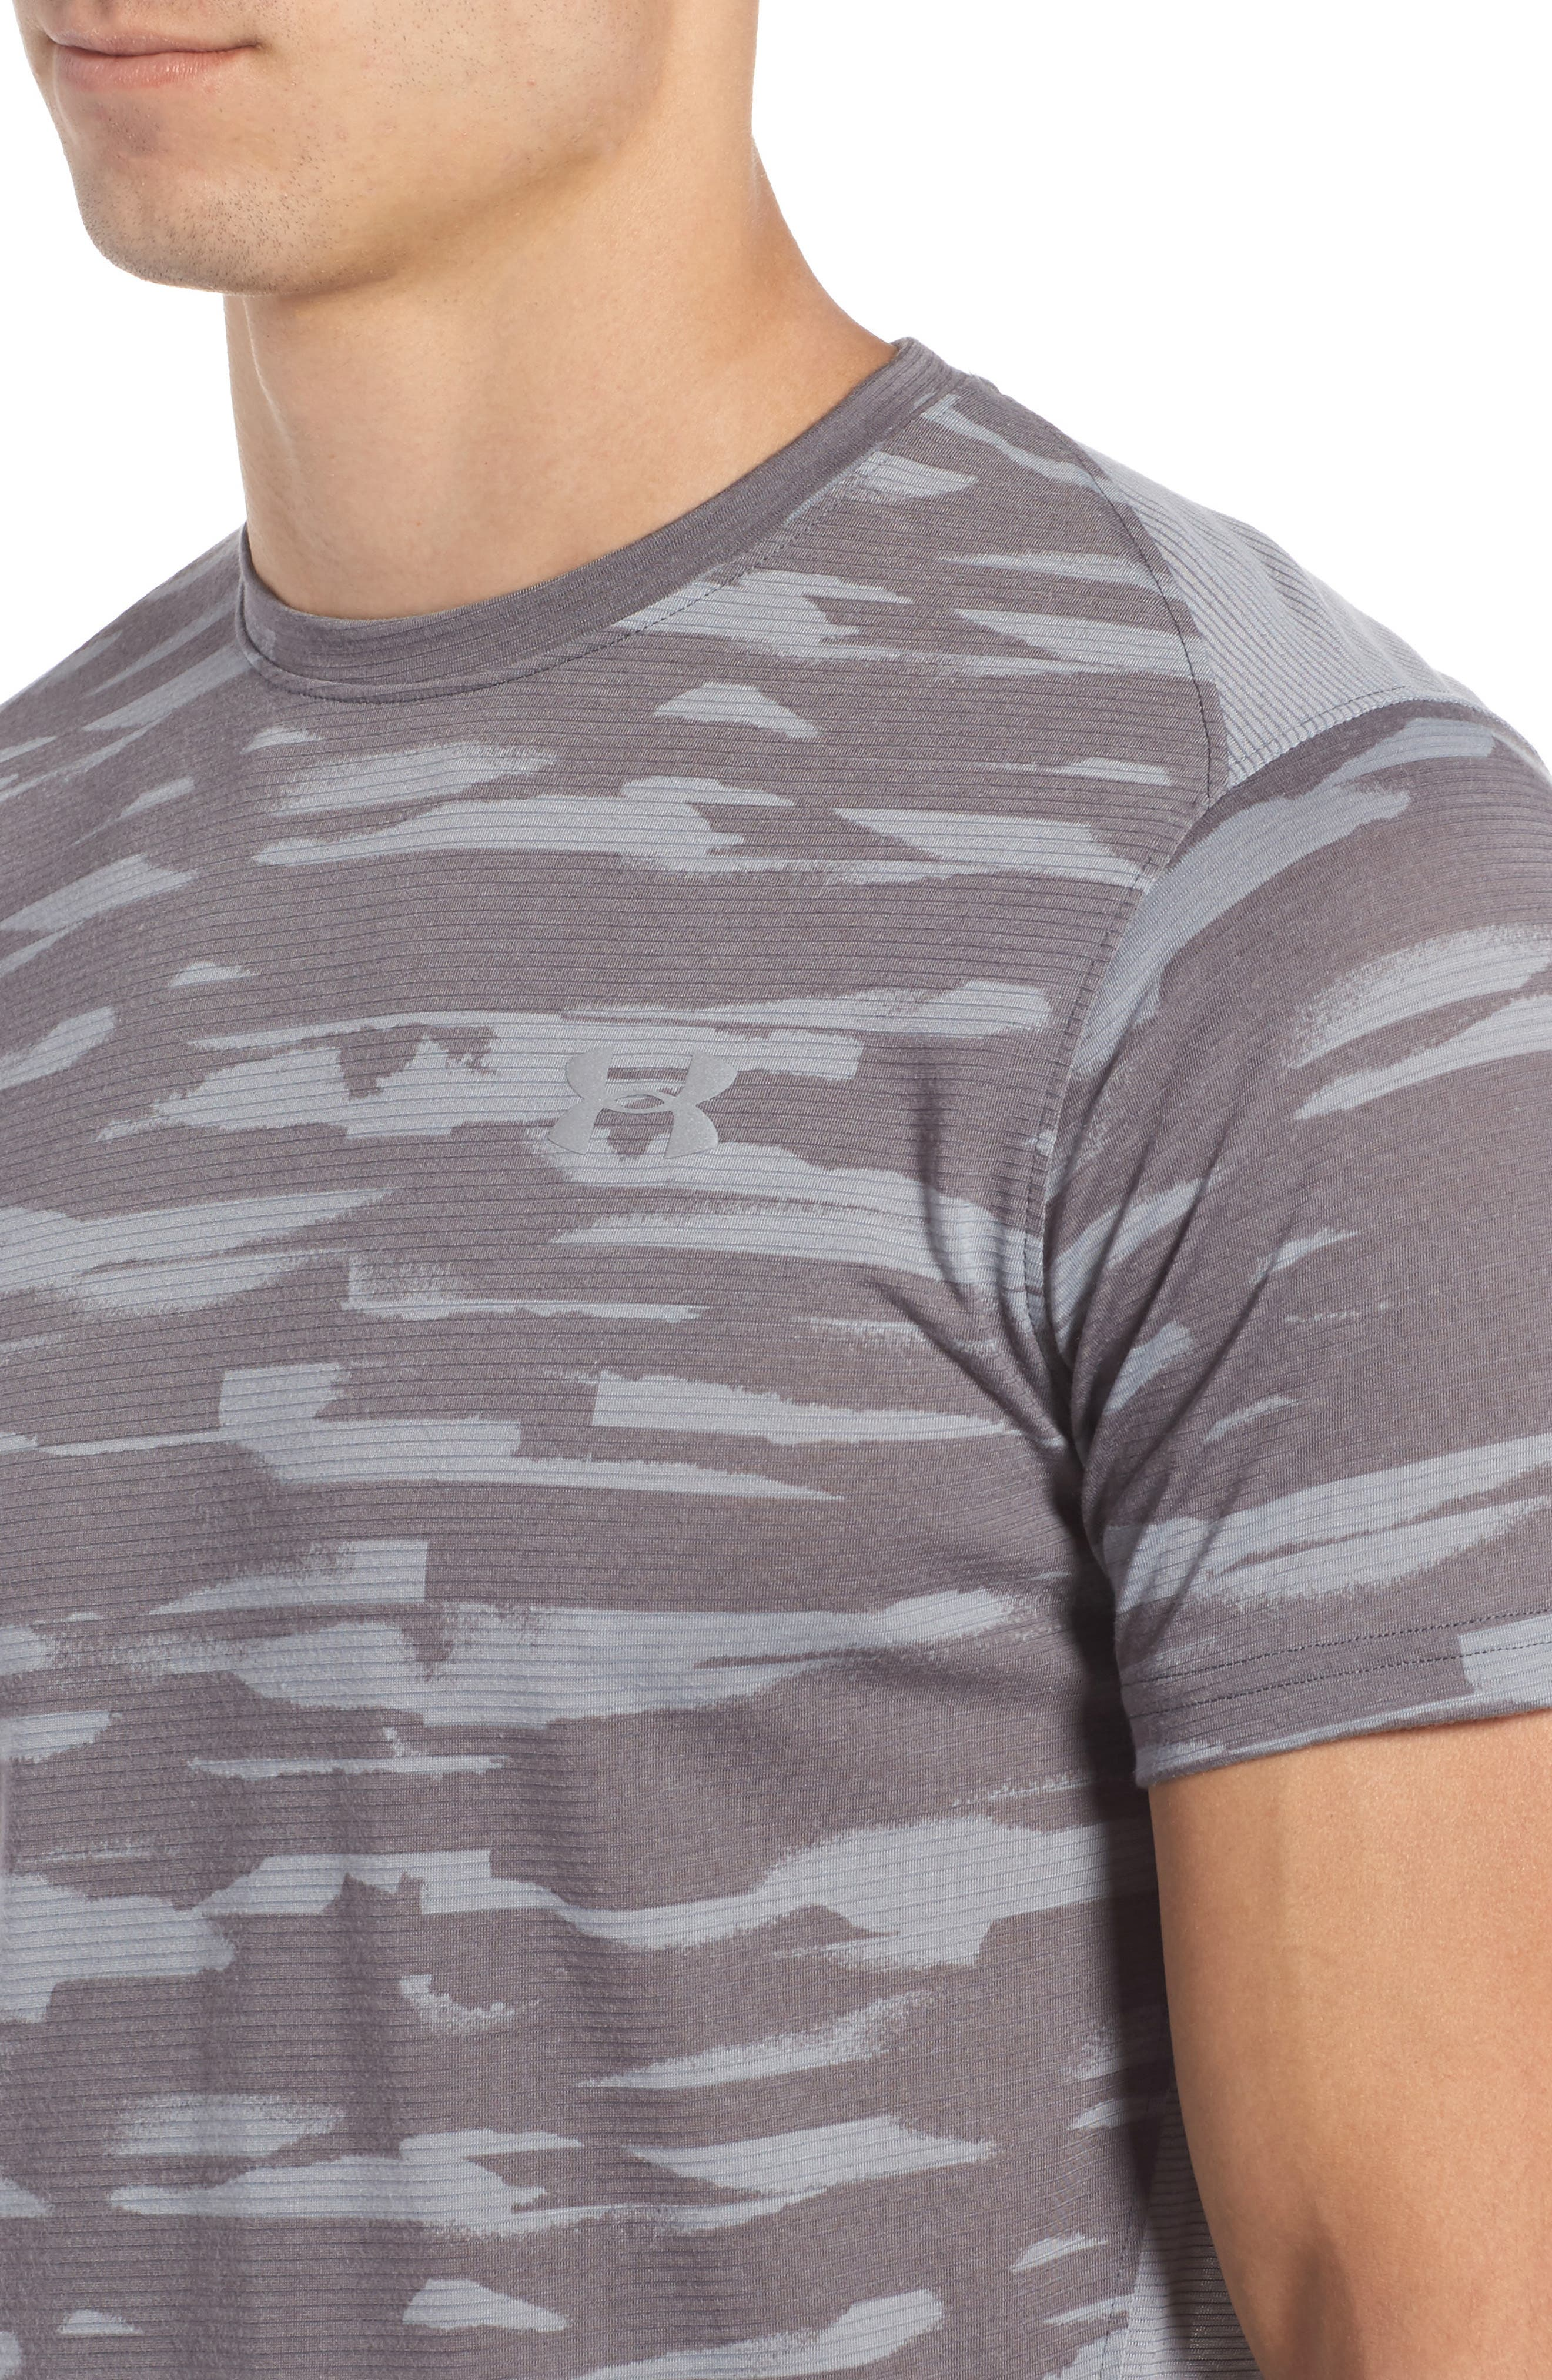 Threadborne Mesh Running T-Shirt,                             Alternate thumbnail 4, color,                             Grey / Black / Reflective